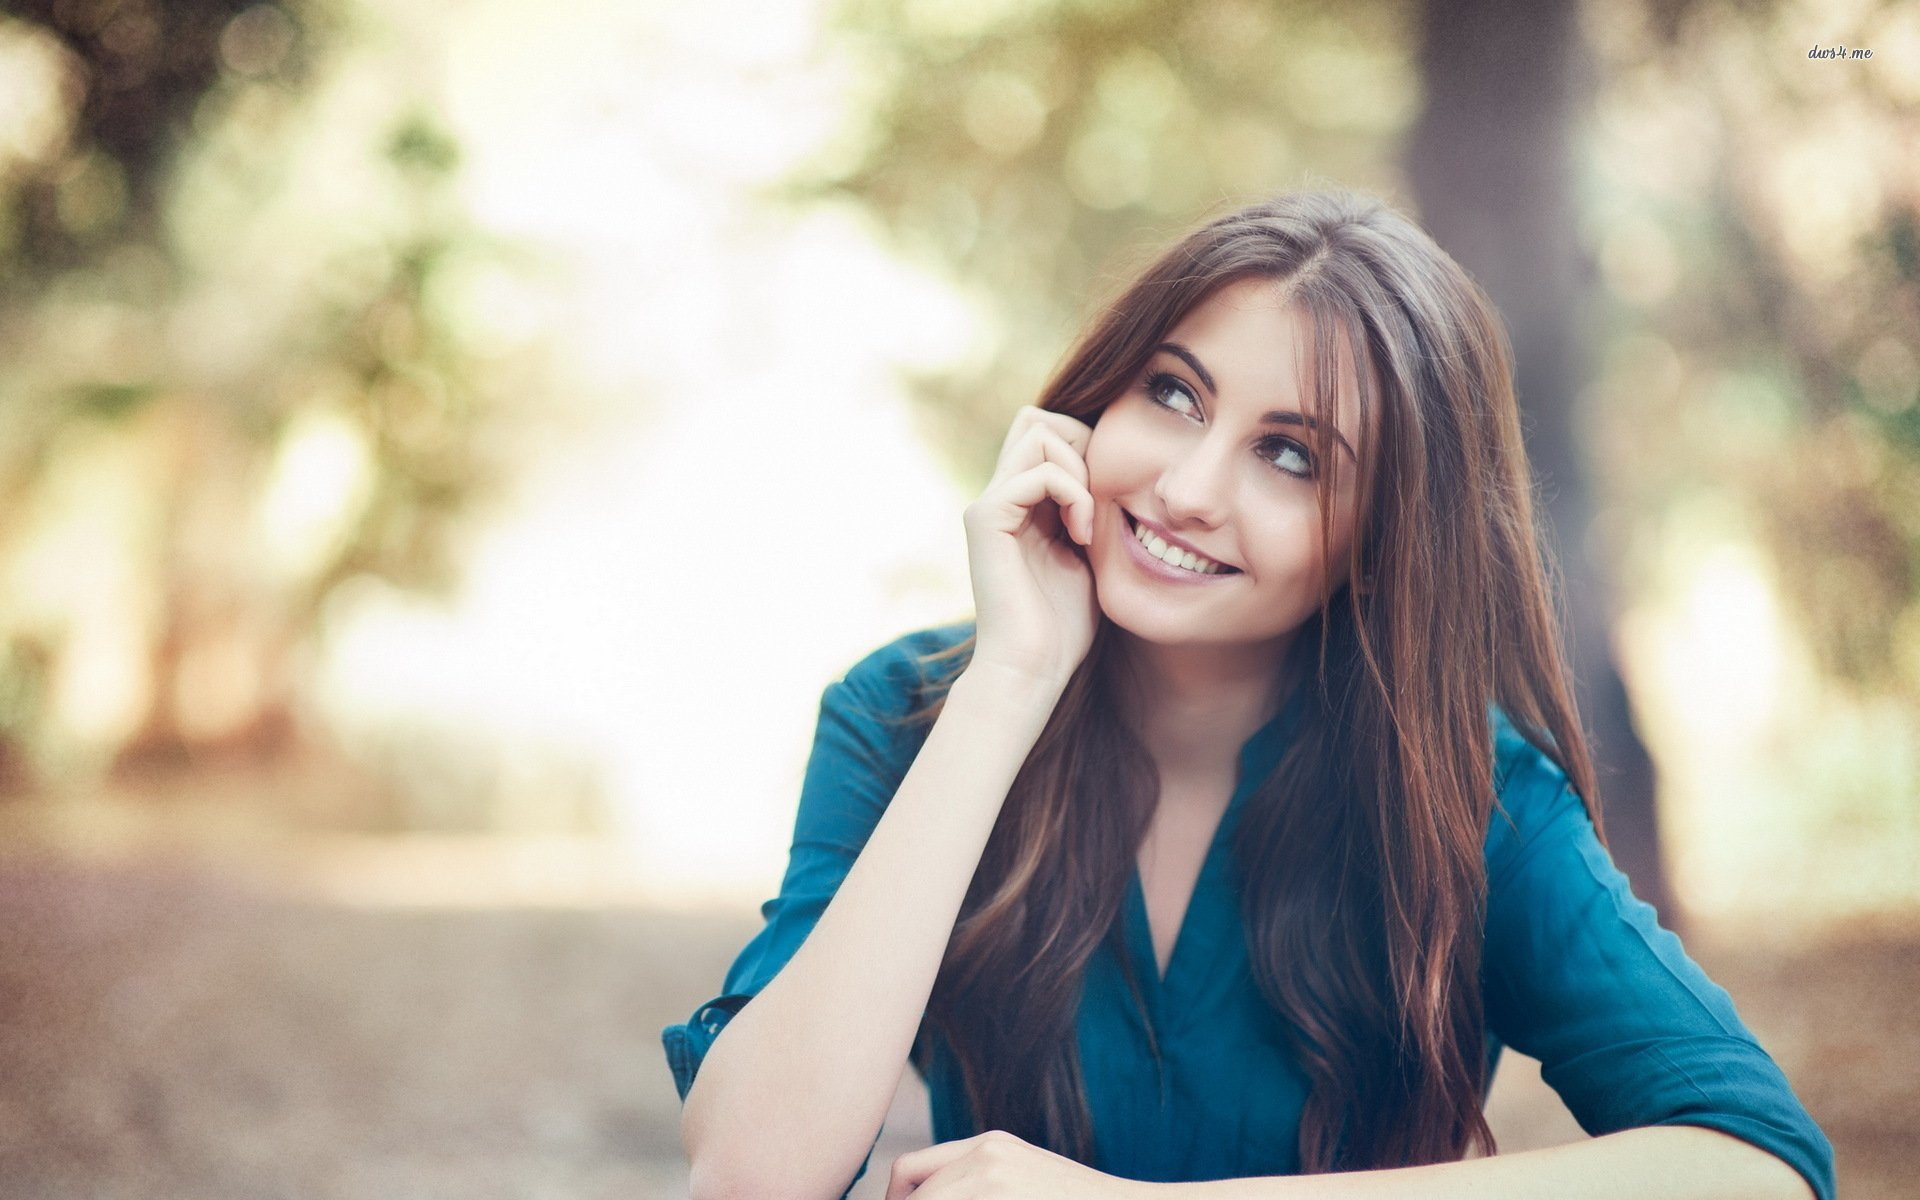 How to Seduce a Beautiful Woman 2019?